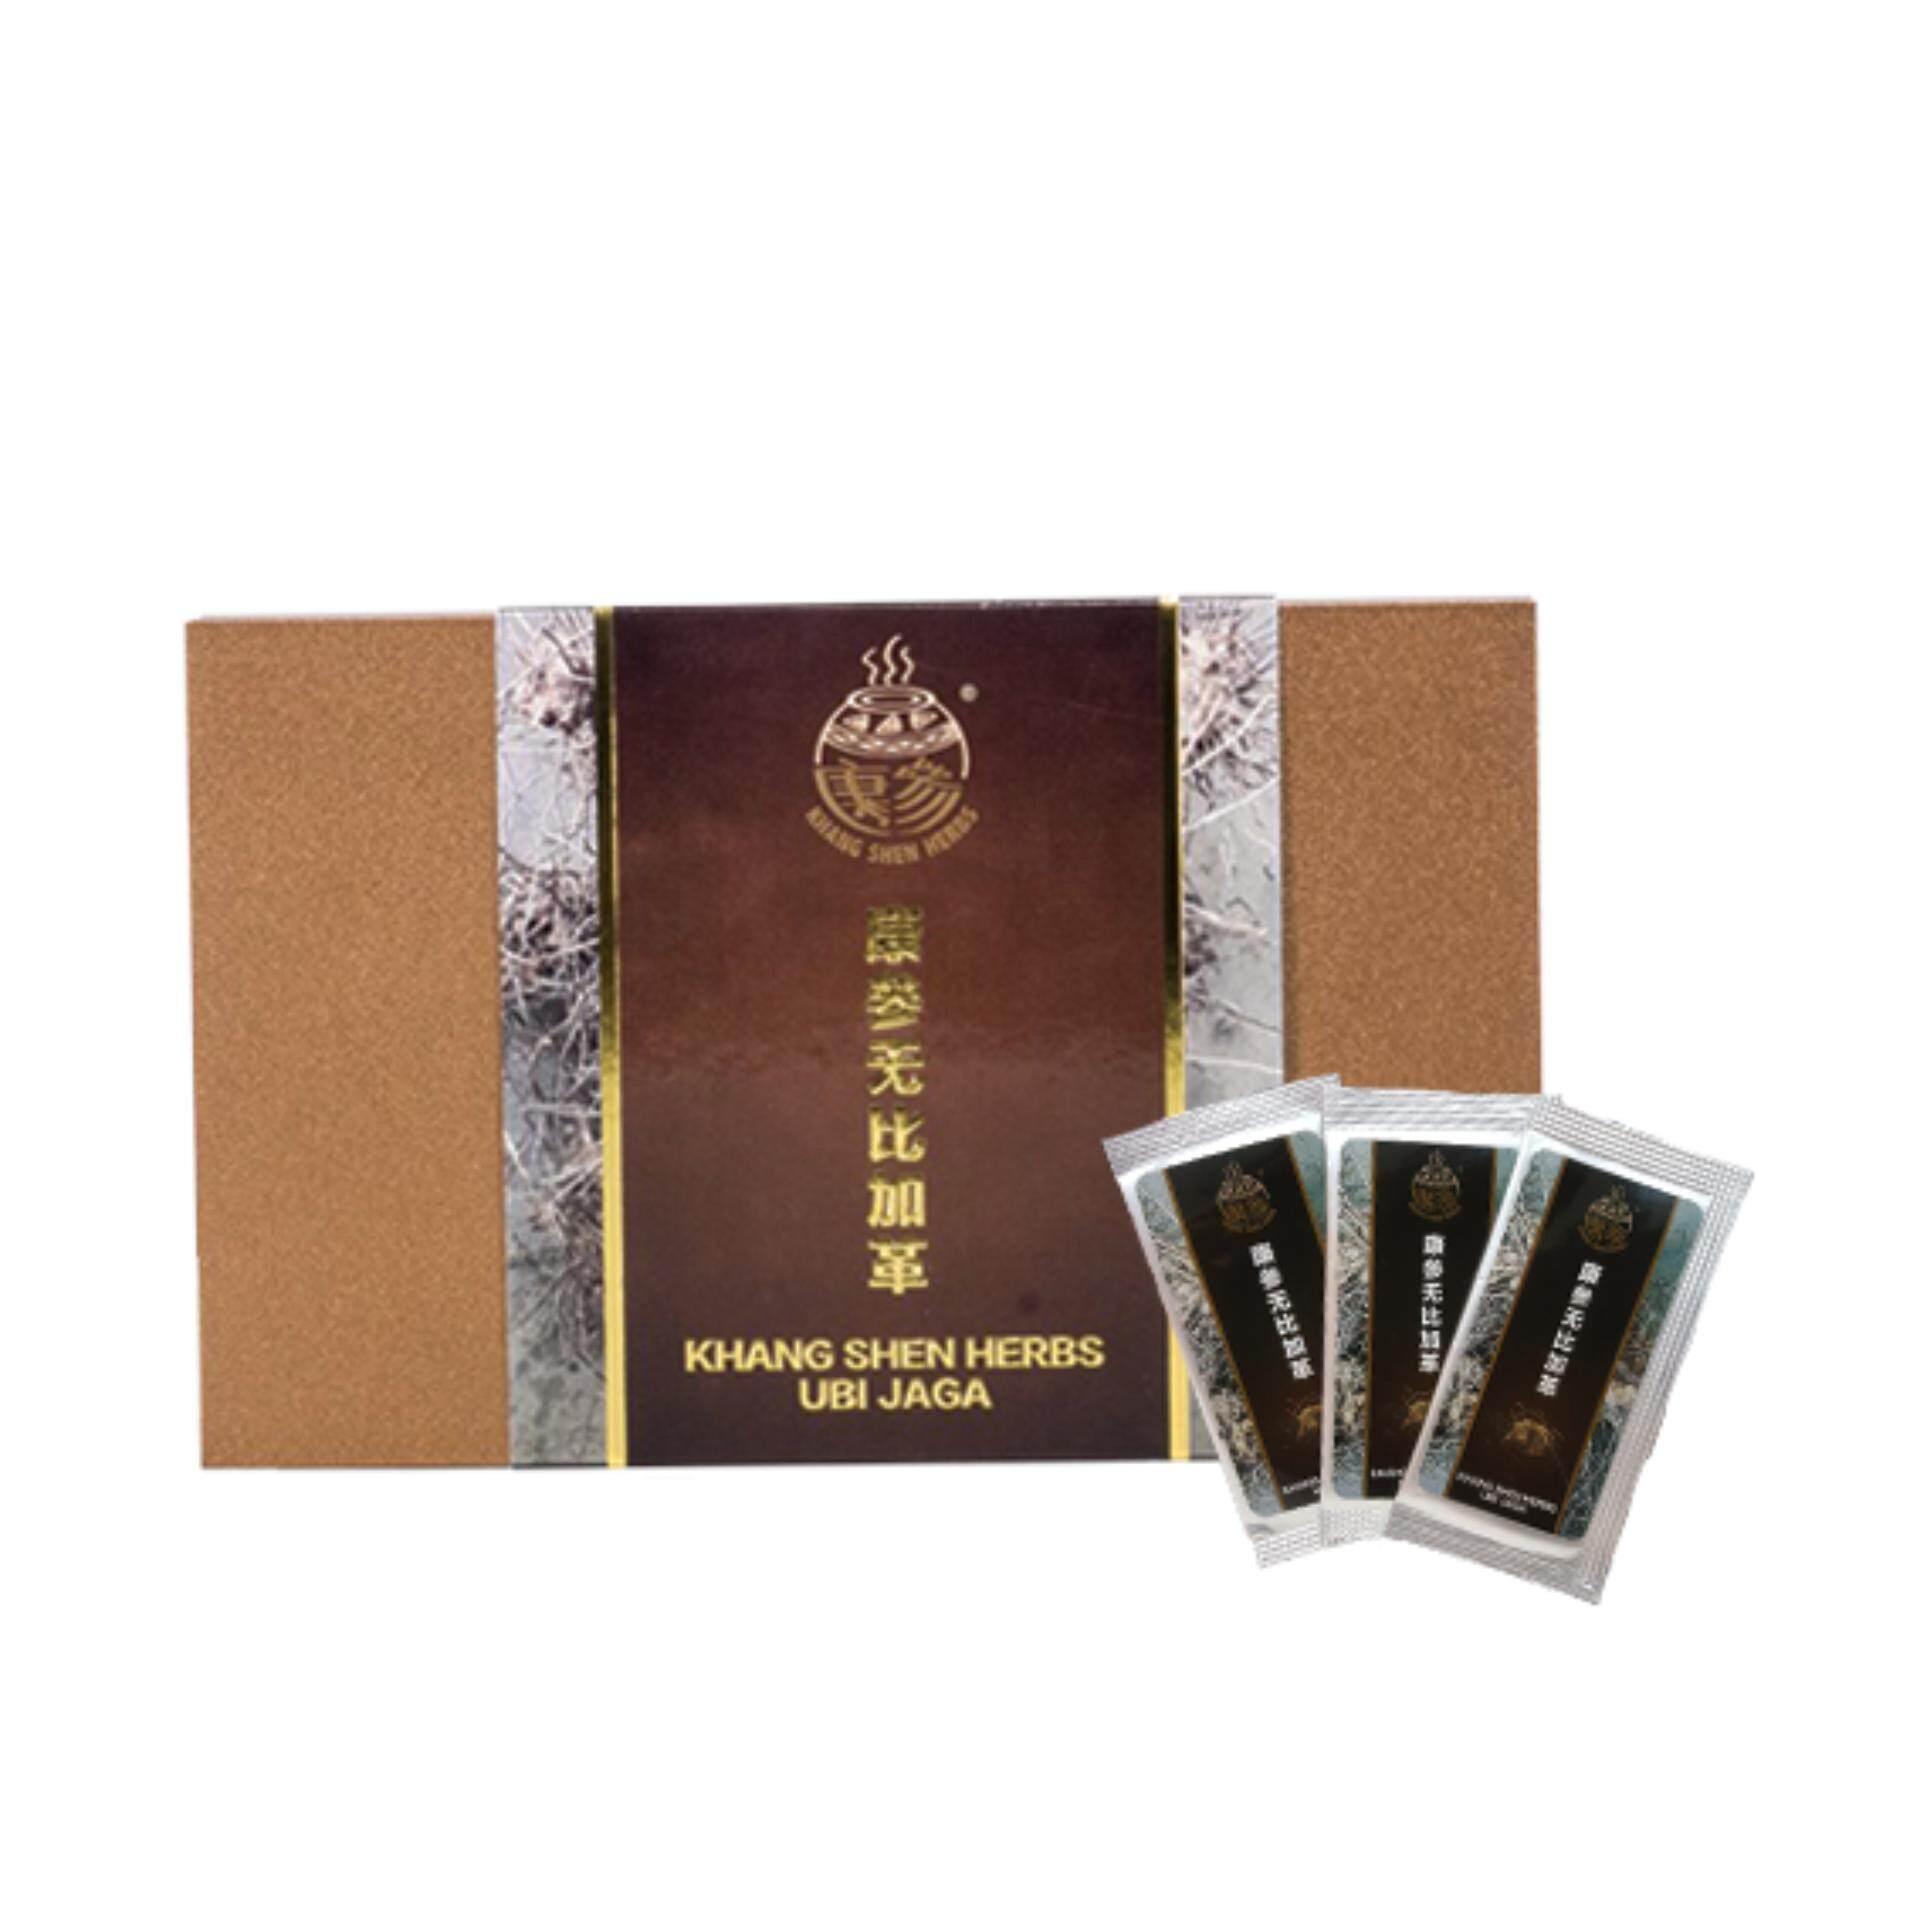 Khang Shen Herbs Ubi Jaga Powder for men